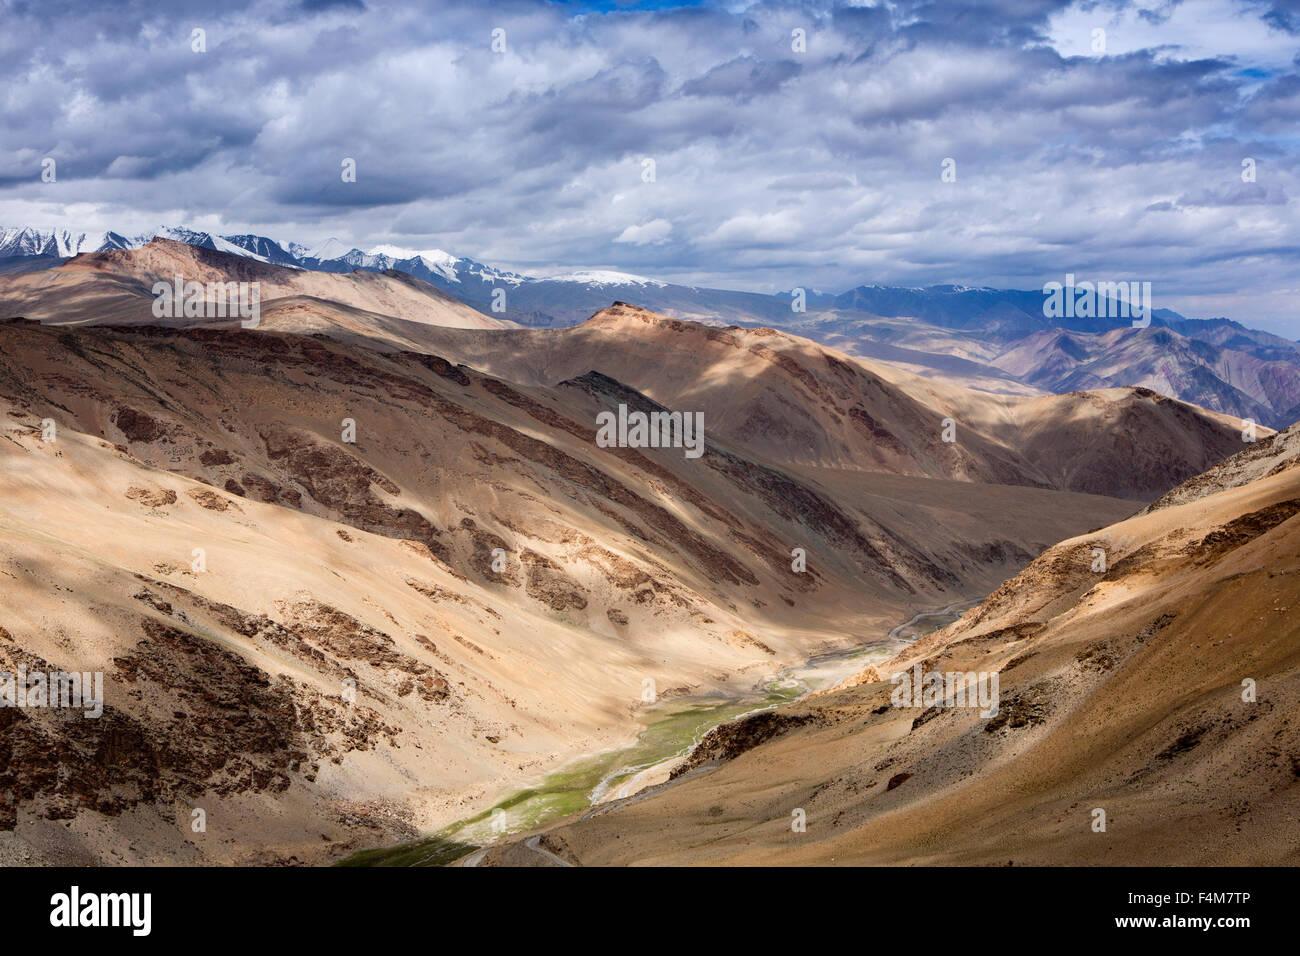 India, Jammu & Kashmir, Ladakh, Rumtse, snow capped mountains on approach to Taglang La pass - Stock Image